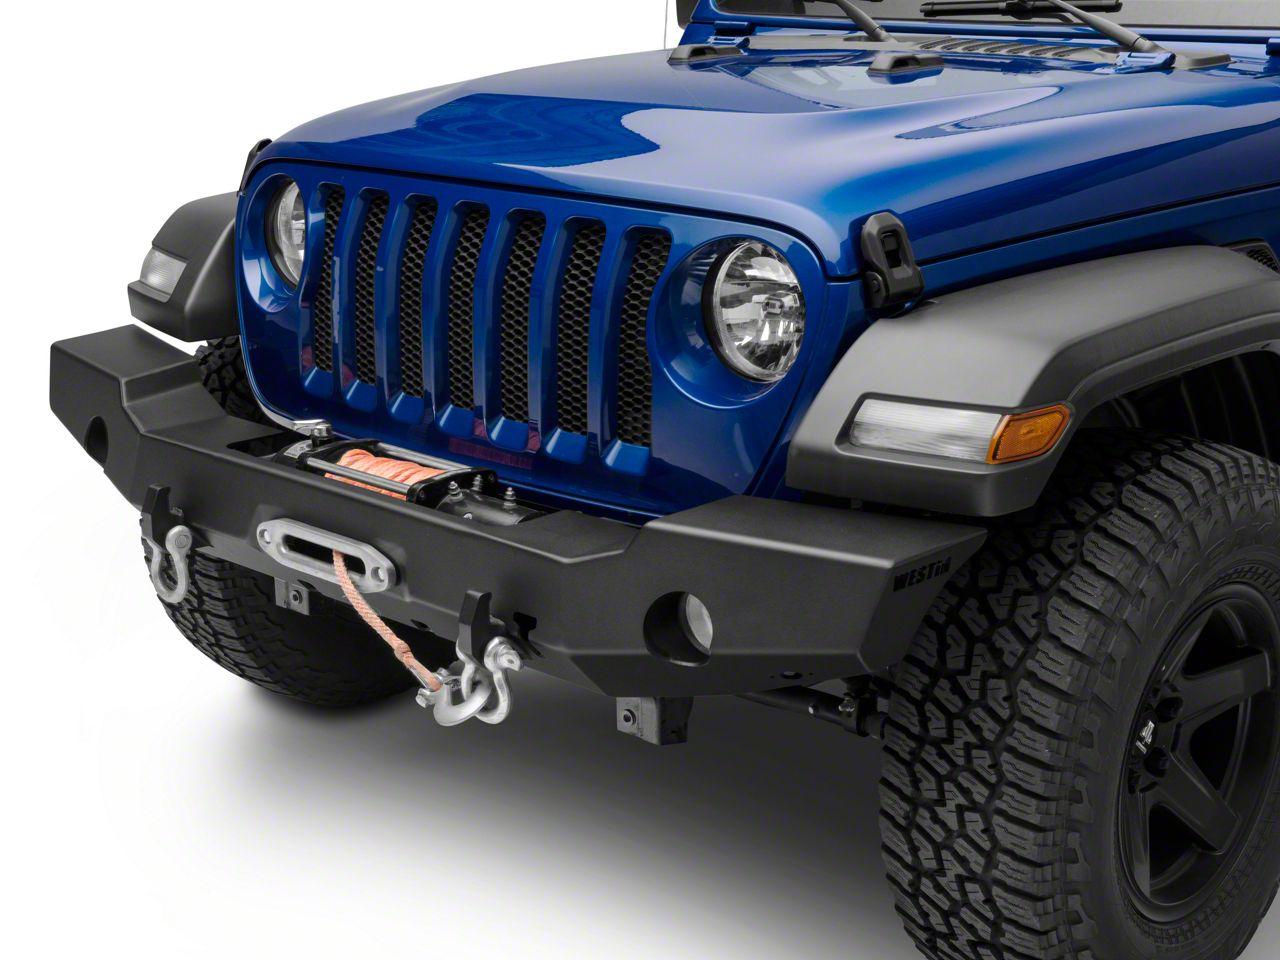 Westin WJ2 Full Width Front Bumper - Textured Black (2018 Jeep Wrangler JL)